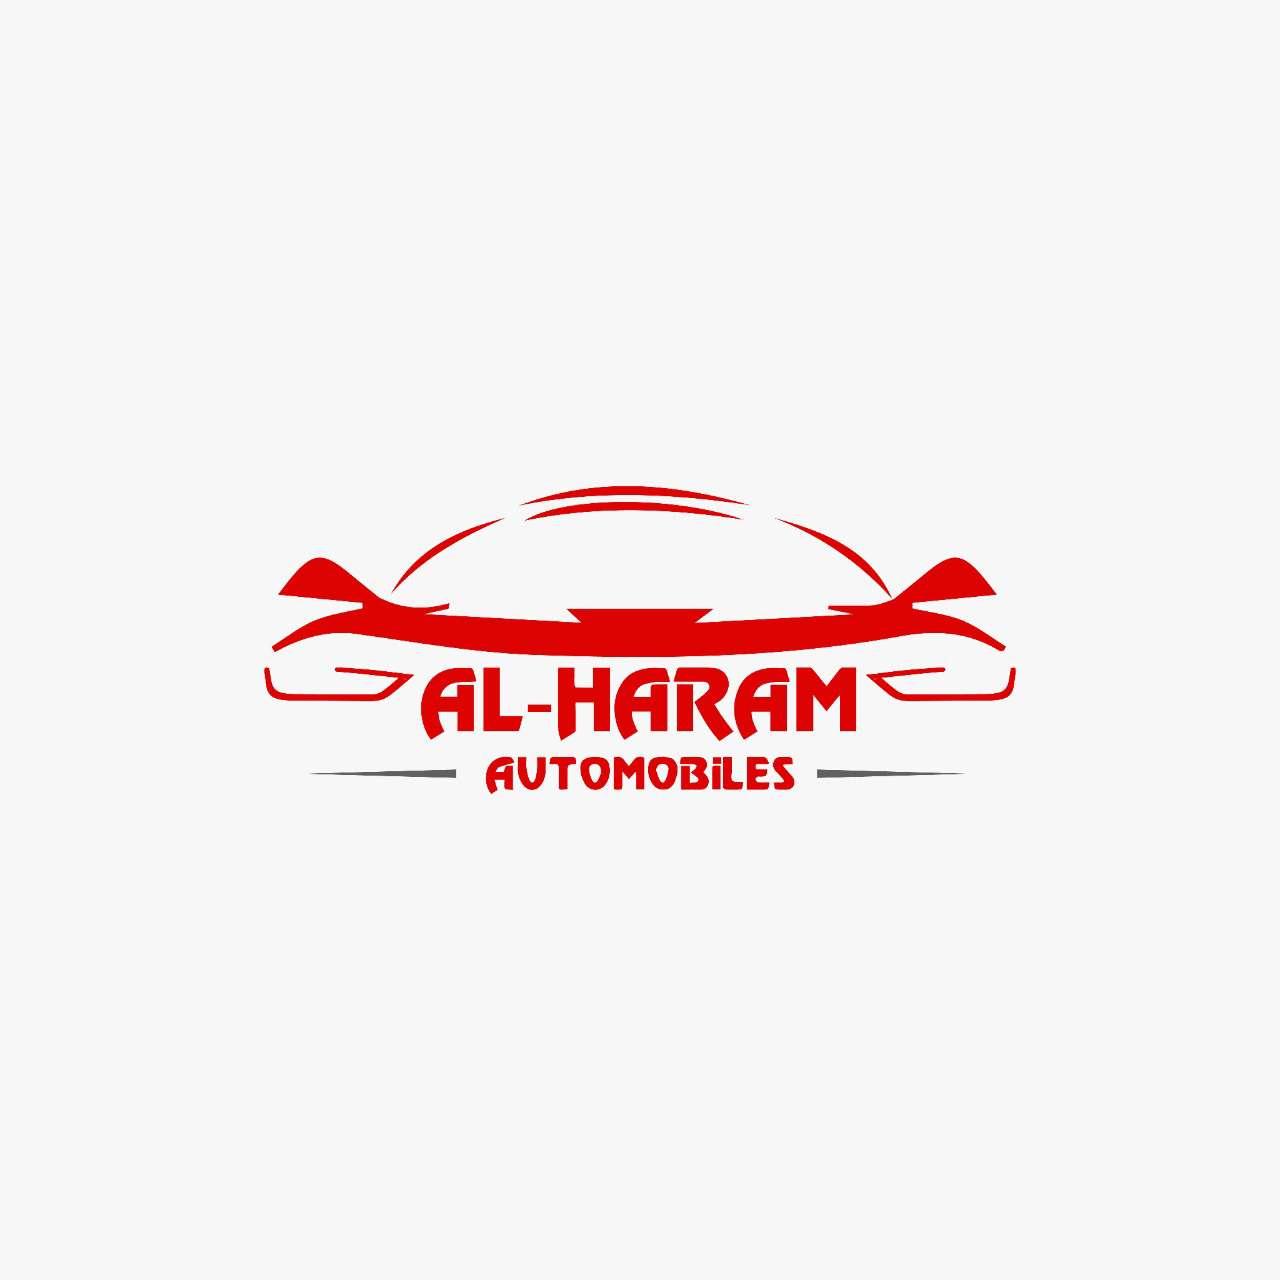 Al Haram Automobiles